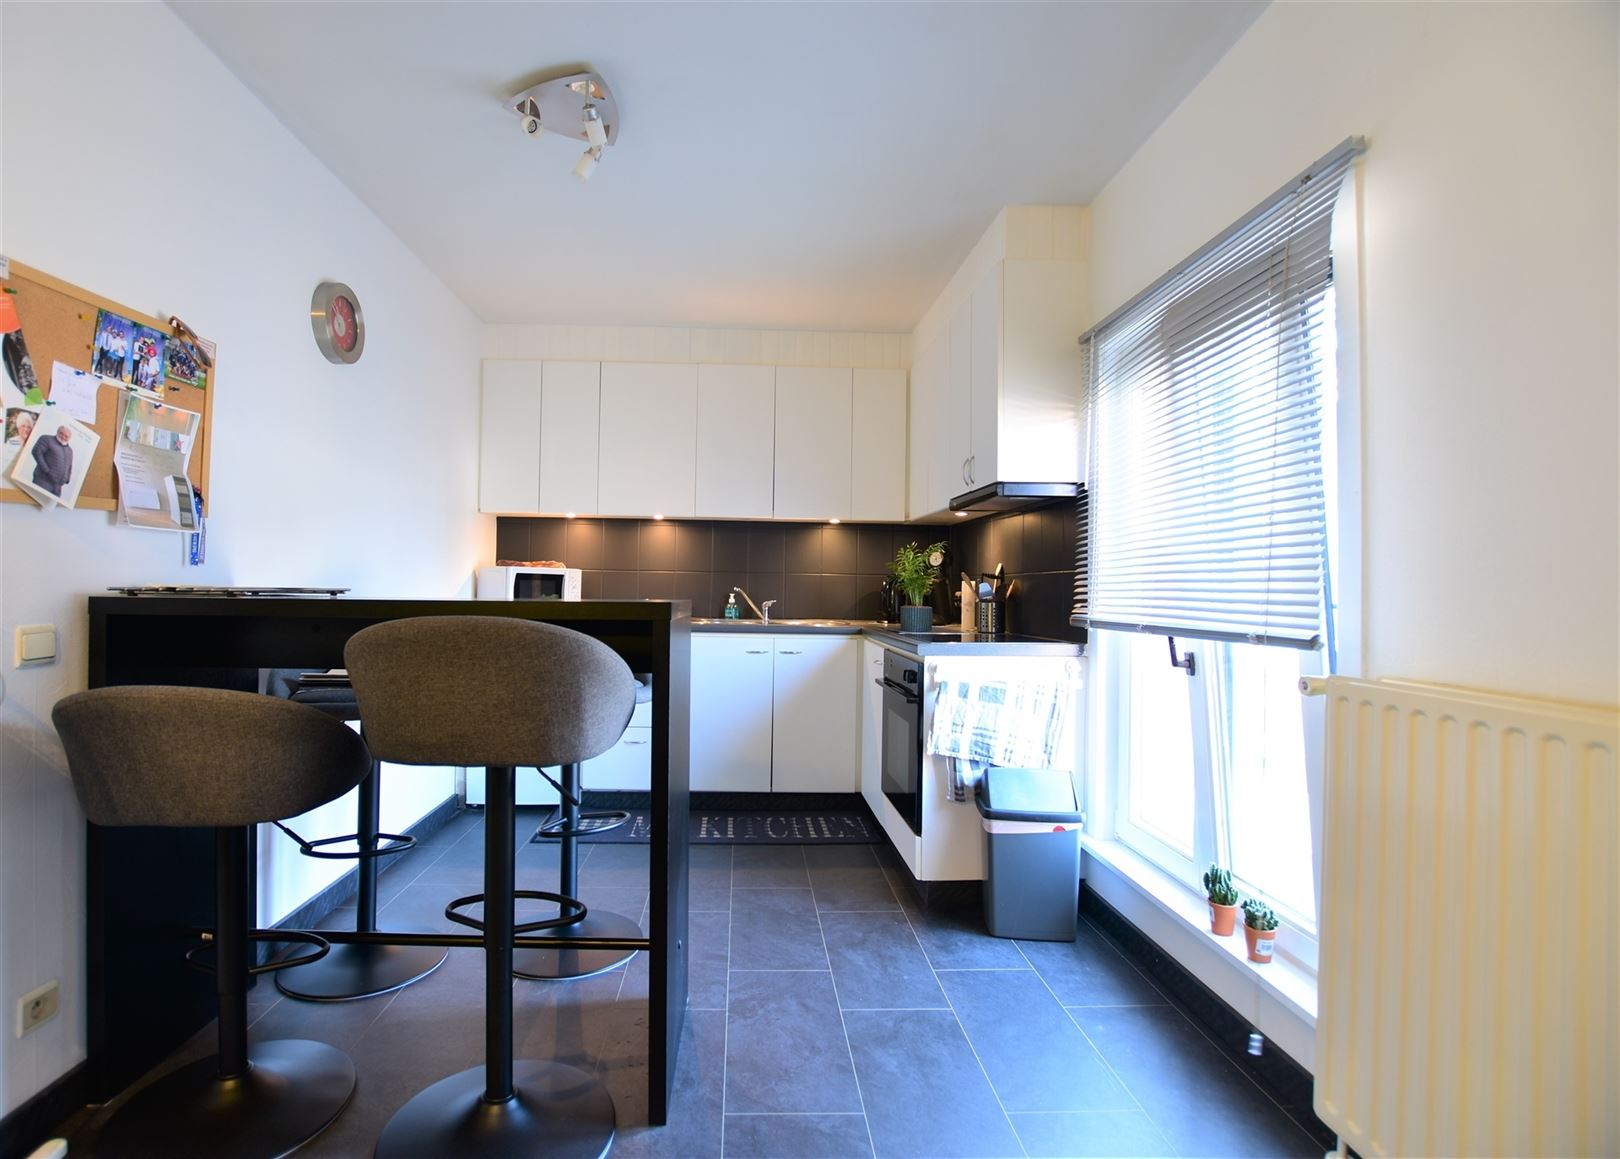 Foto 6 : Duplex/triplex te 9200 BAASRODE (België) - Prijs € 159.000